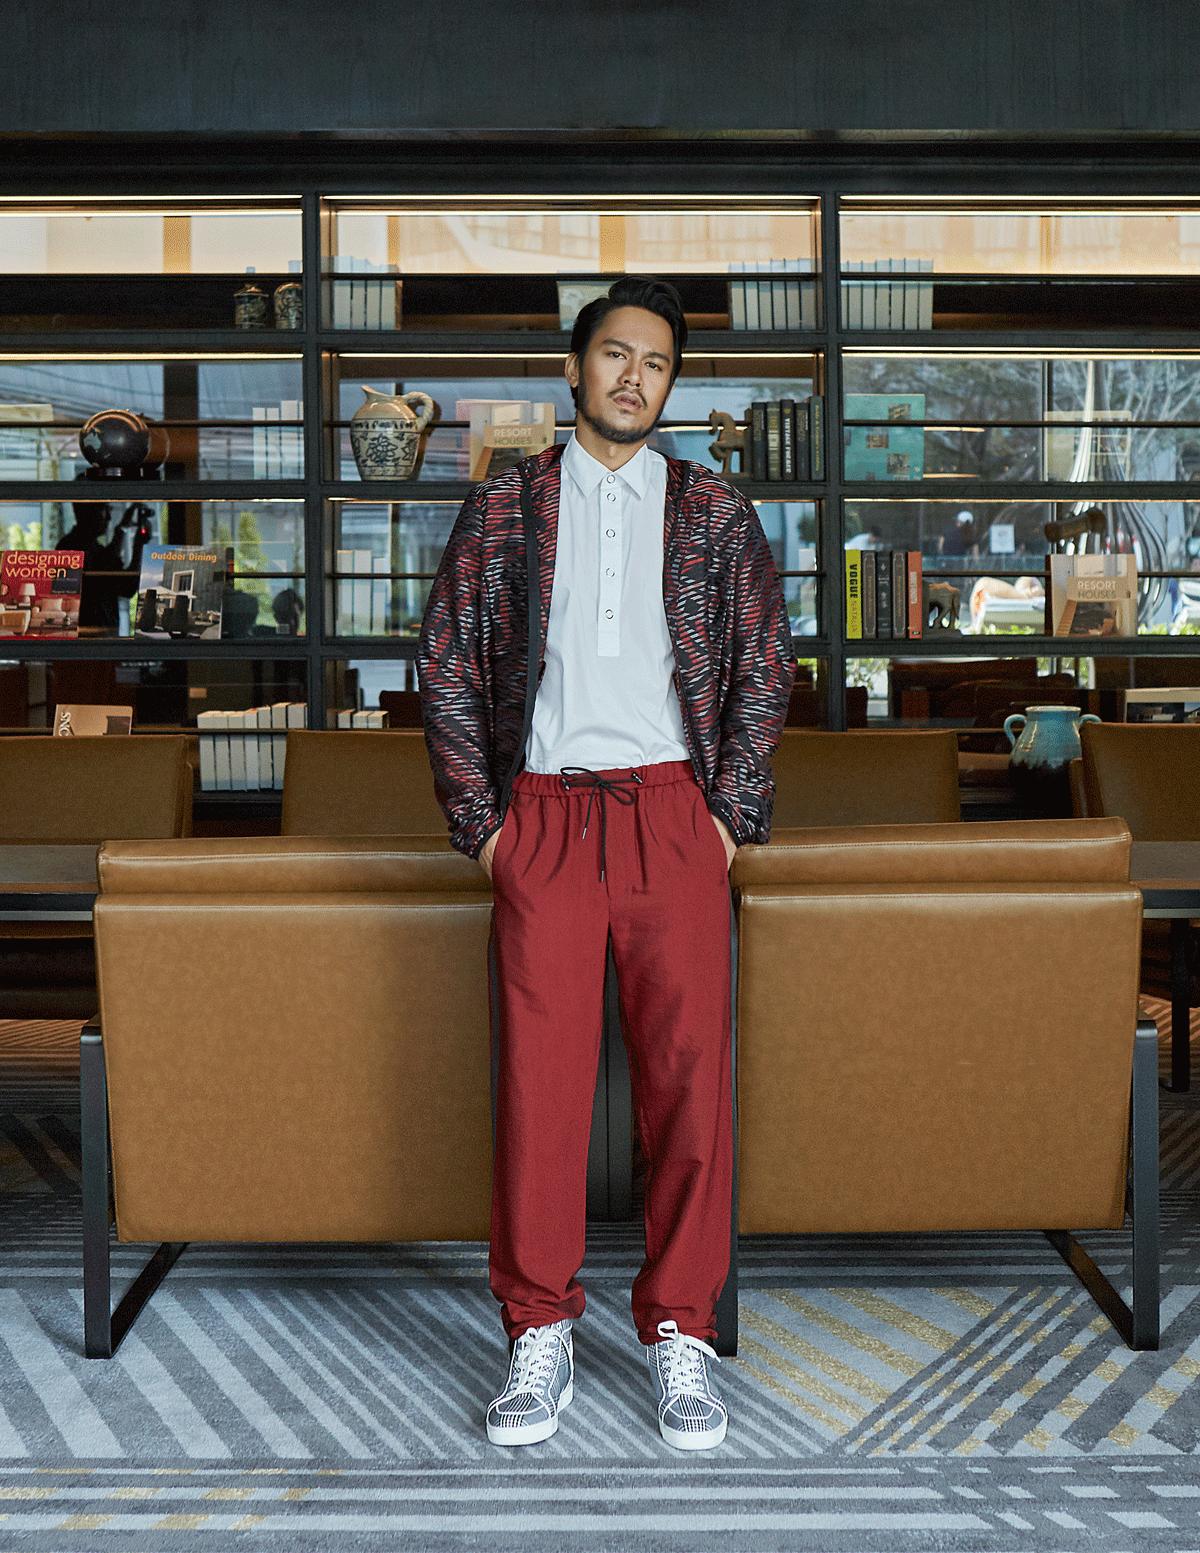 jacket and pants : Emporio Armani / shirt : Calvin Klien Platinum / shoes : Christian Louboutin